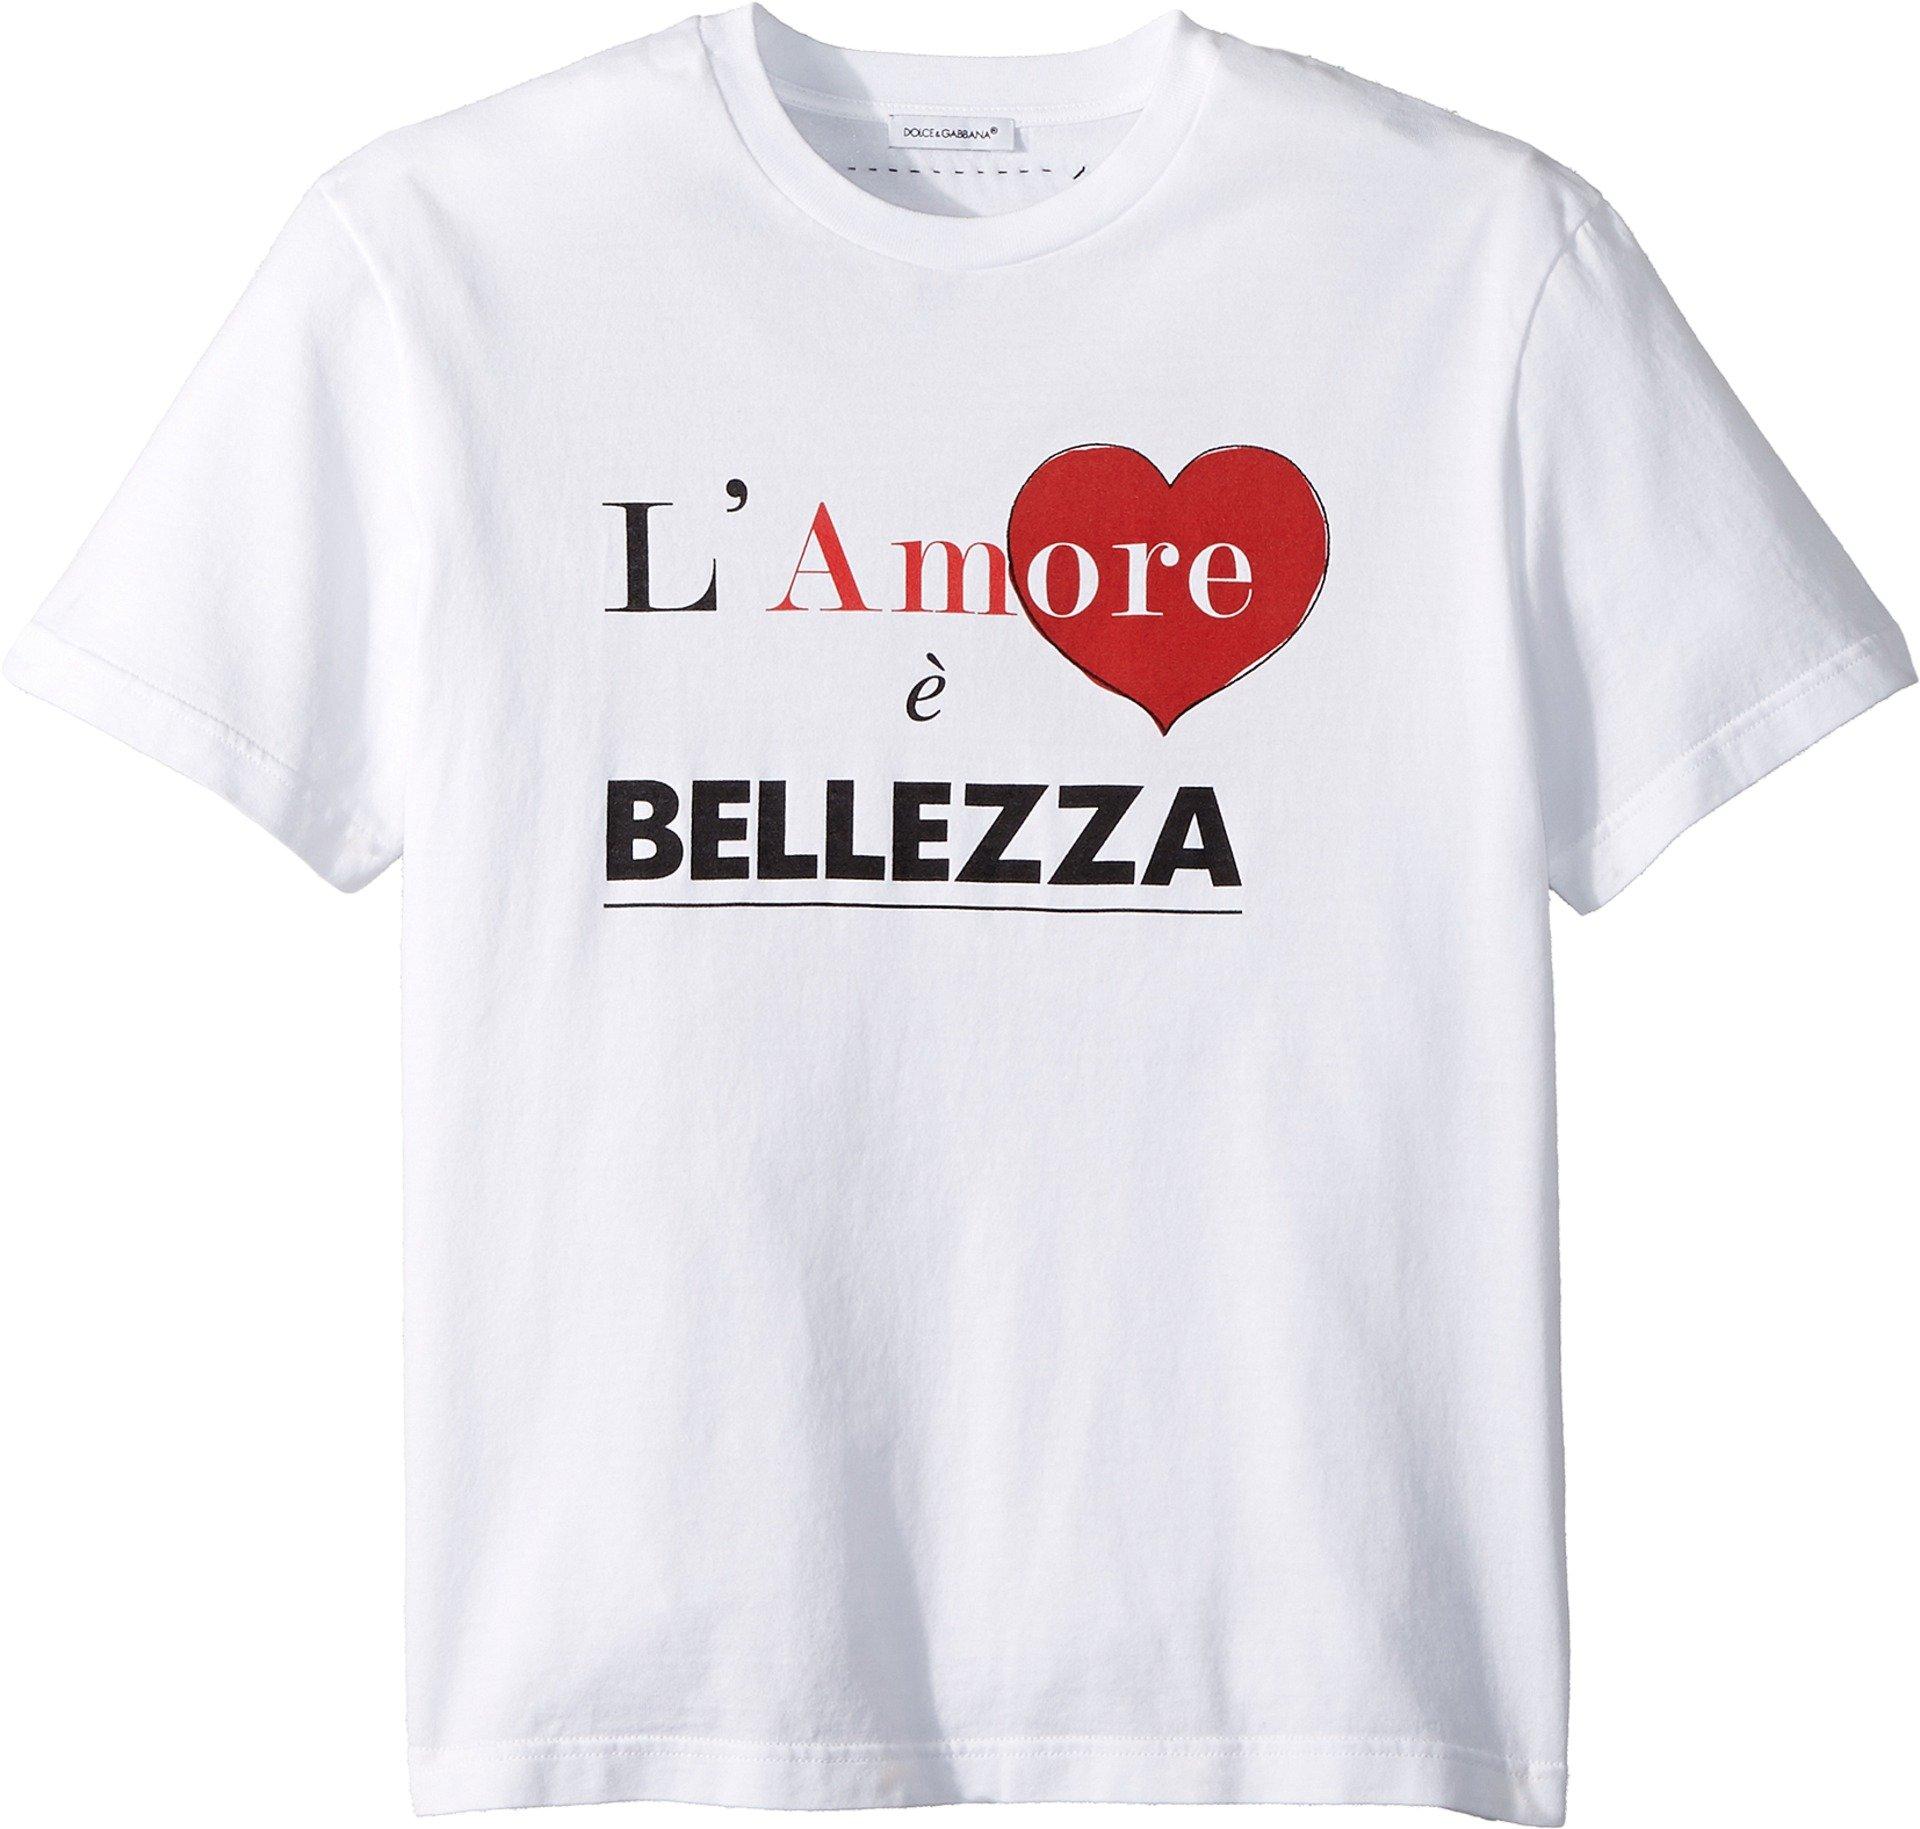 Dolce & Gabbana Kids Girl's Love & Bellezza T-Shirt (Big Kids) White 10